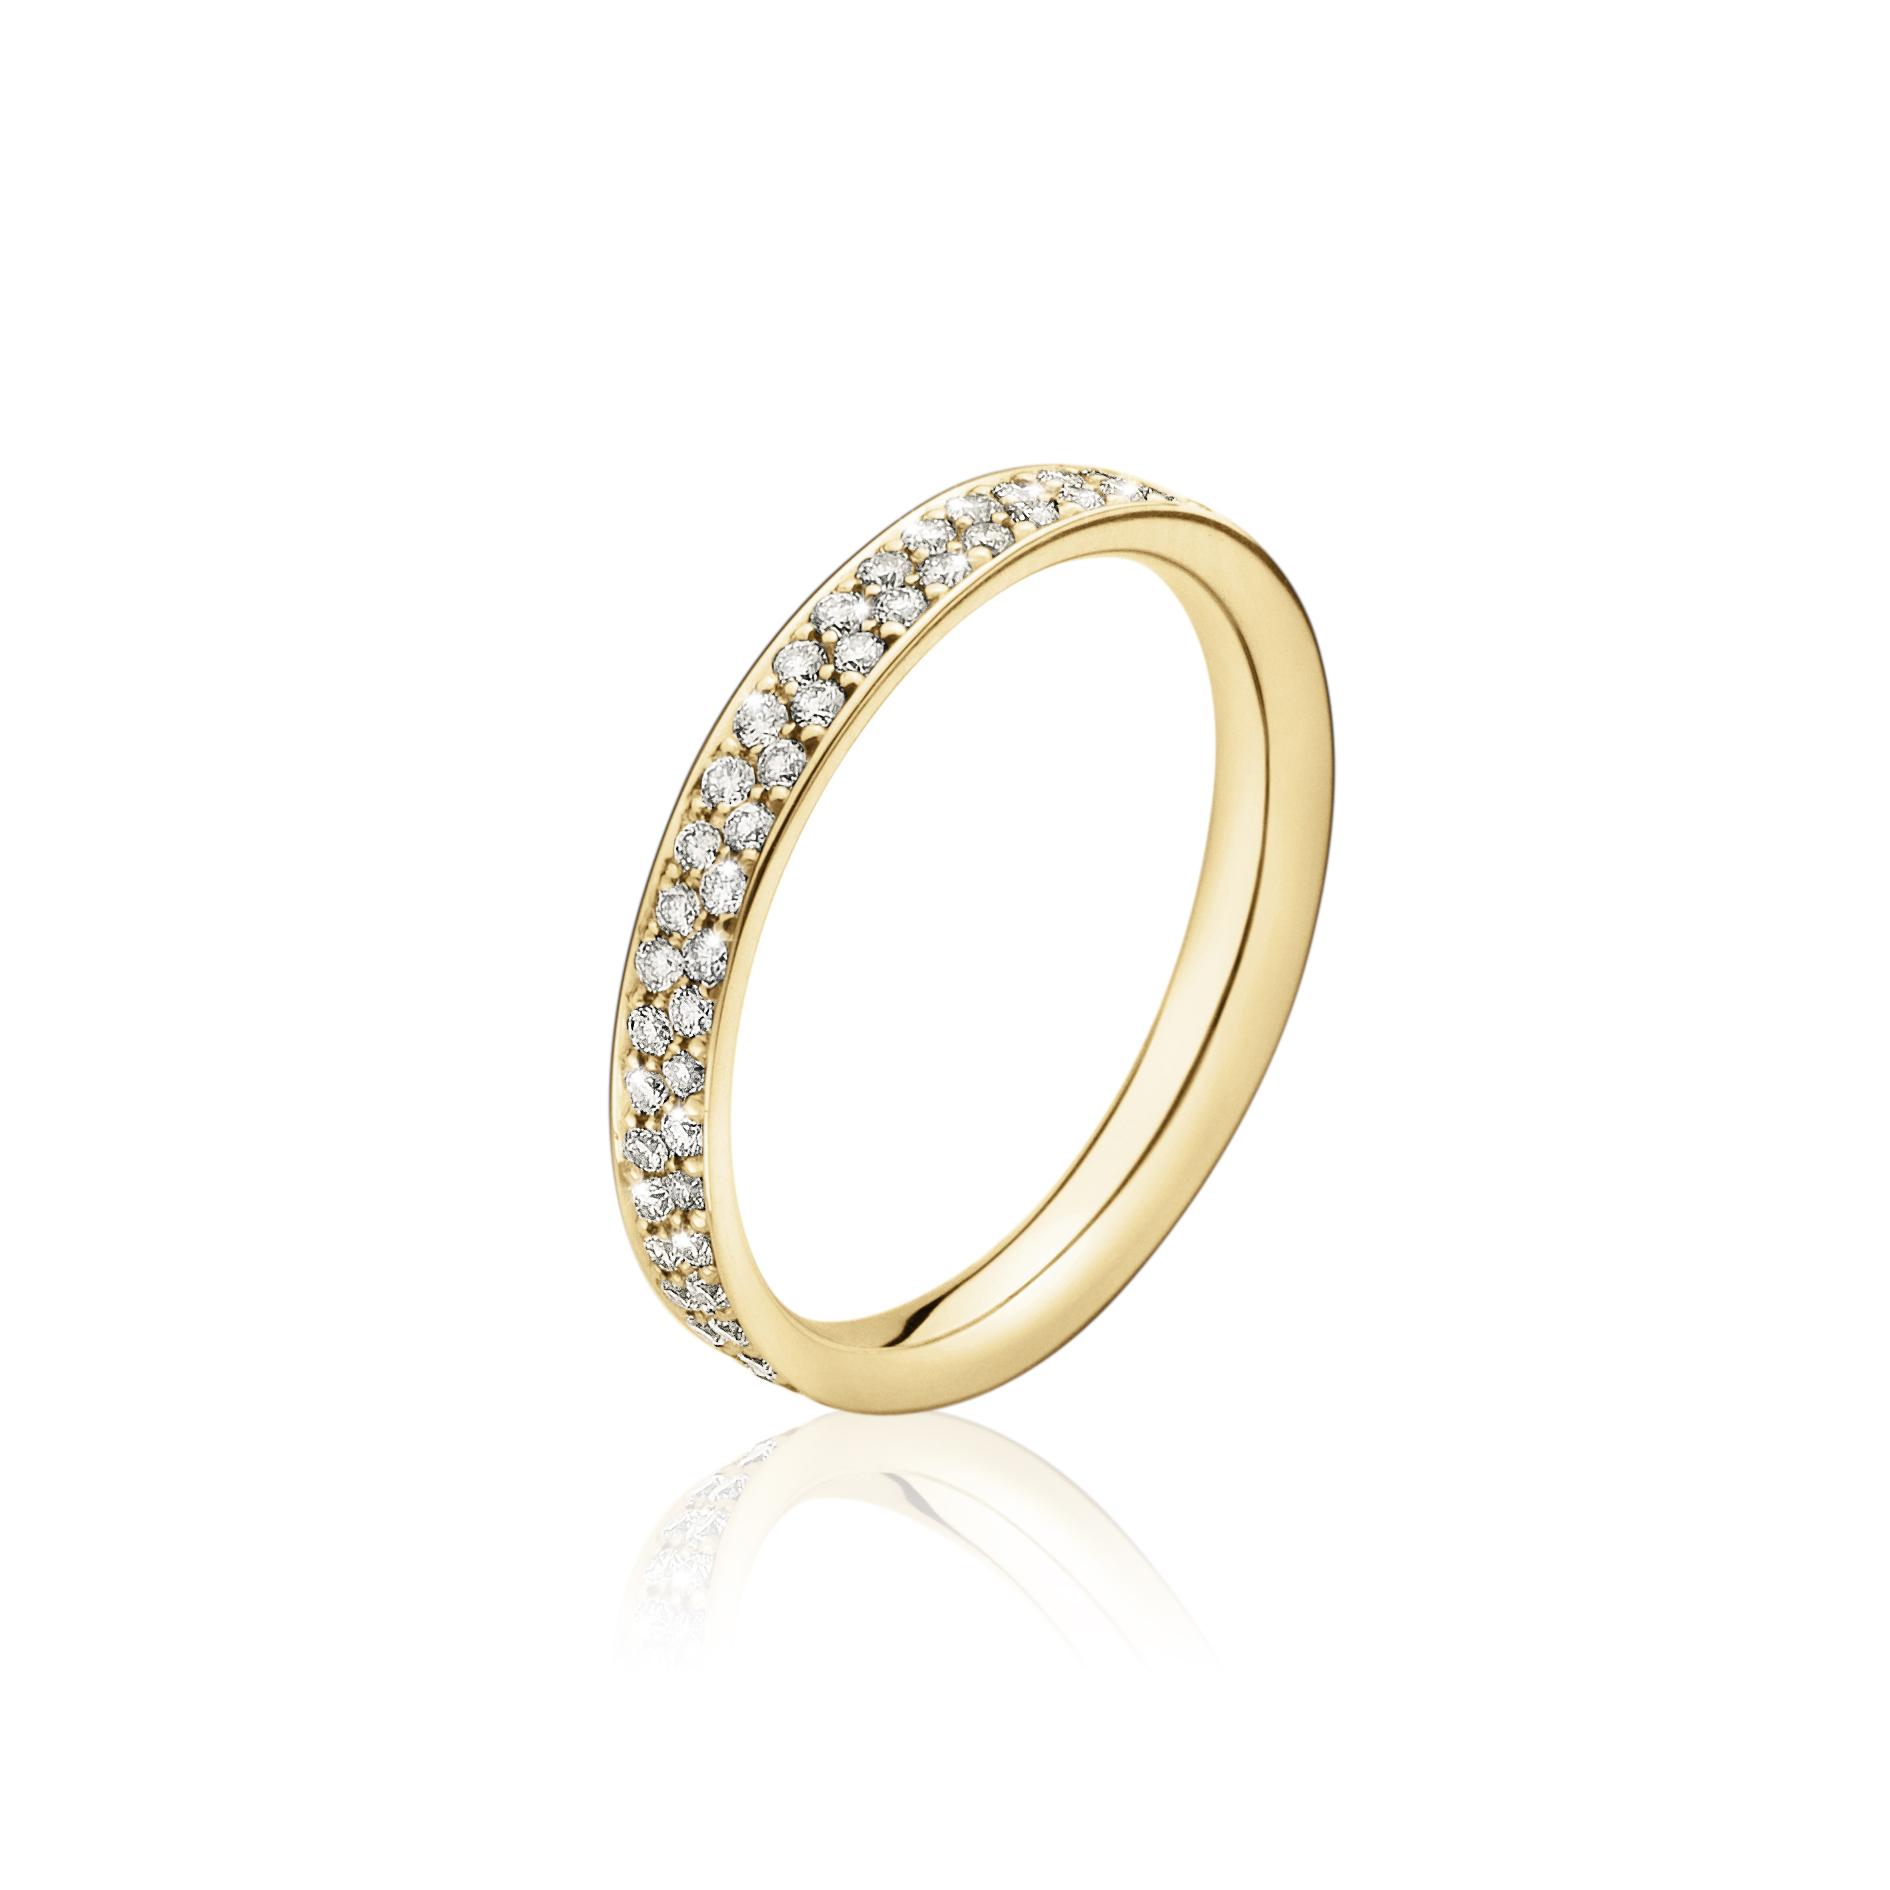 Georg Jensen Magic ring guld - 20000284 18 kt rdg / 0,52 ct 53